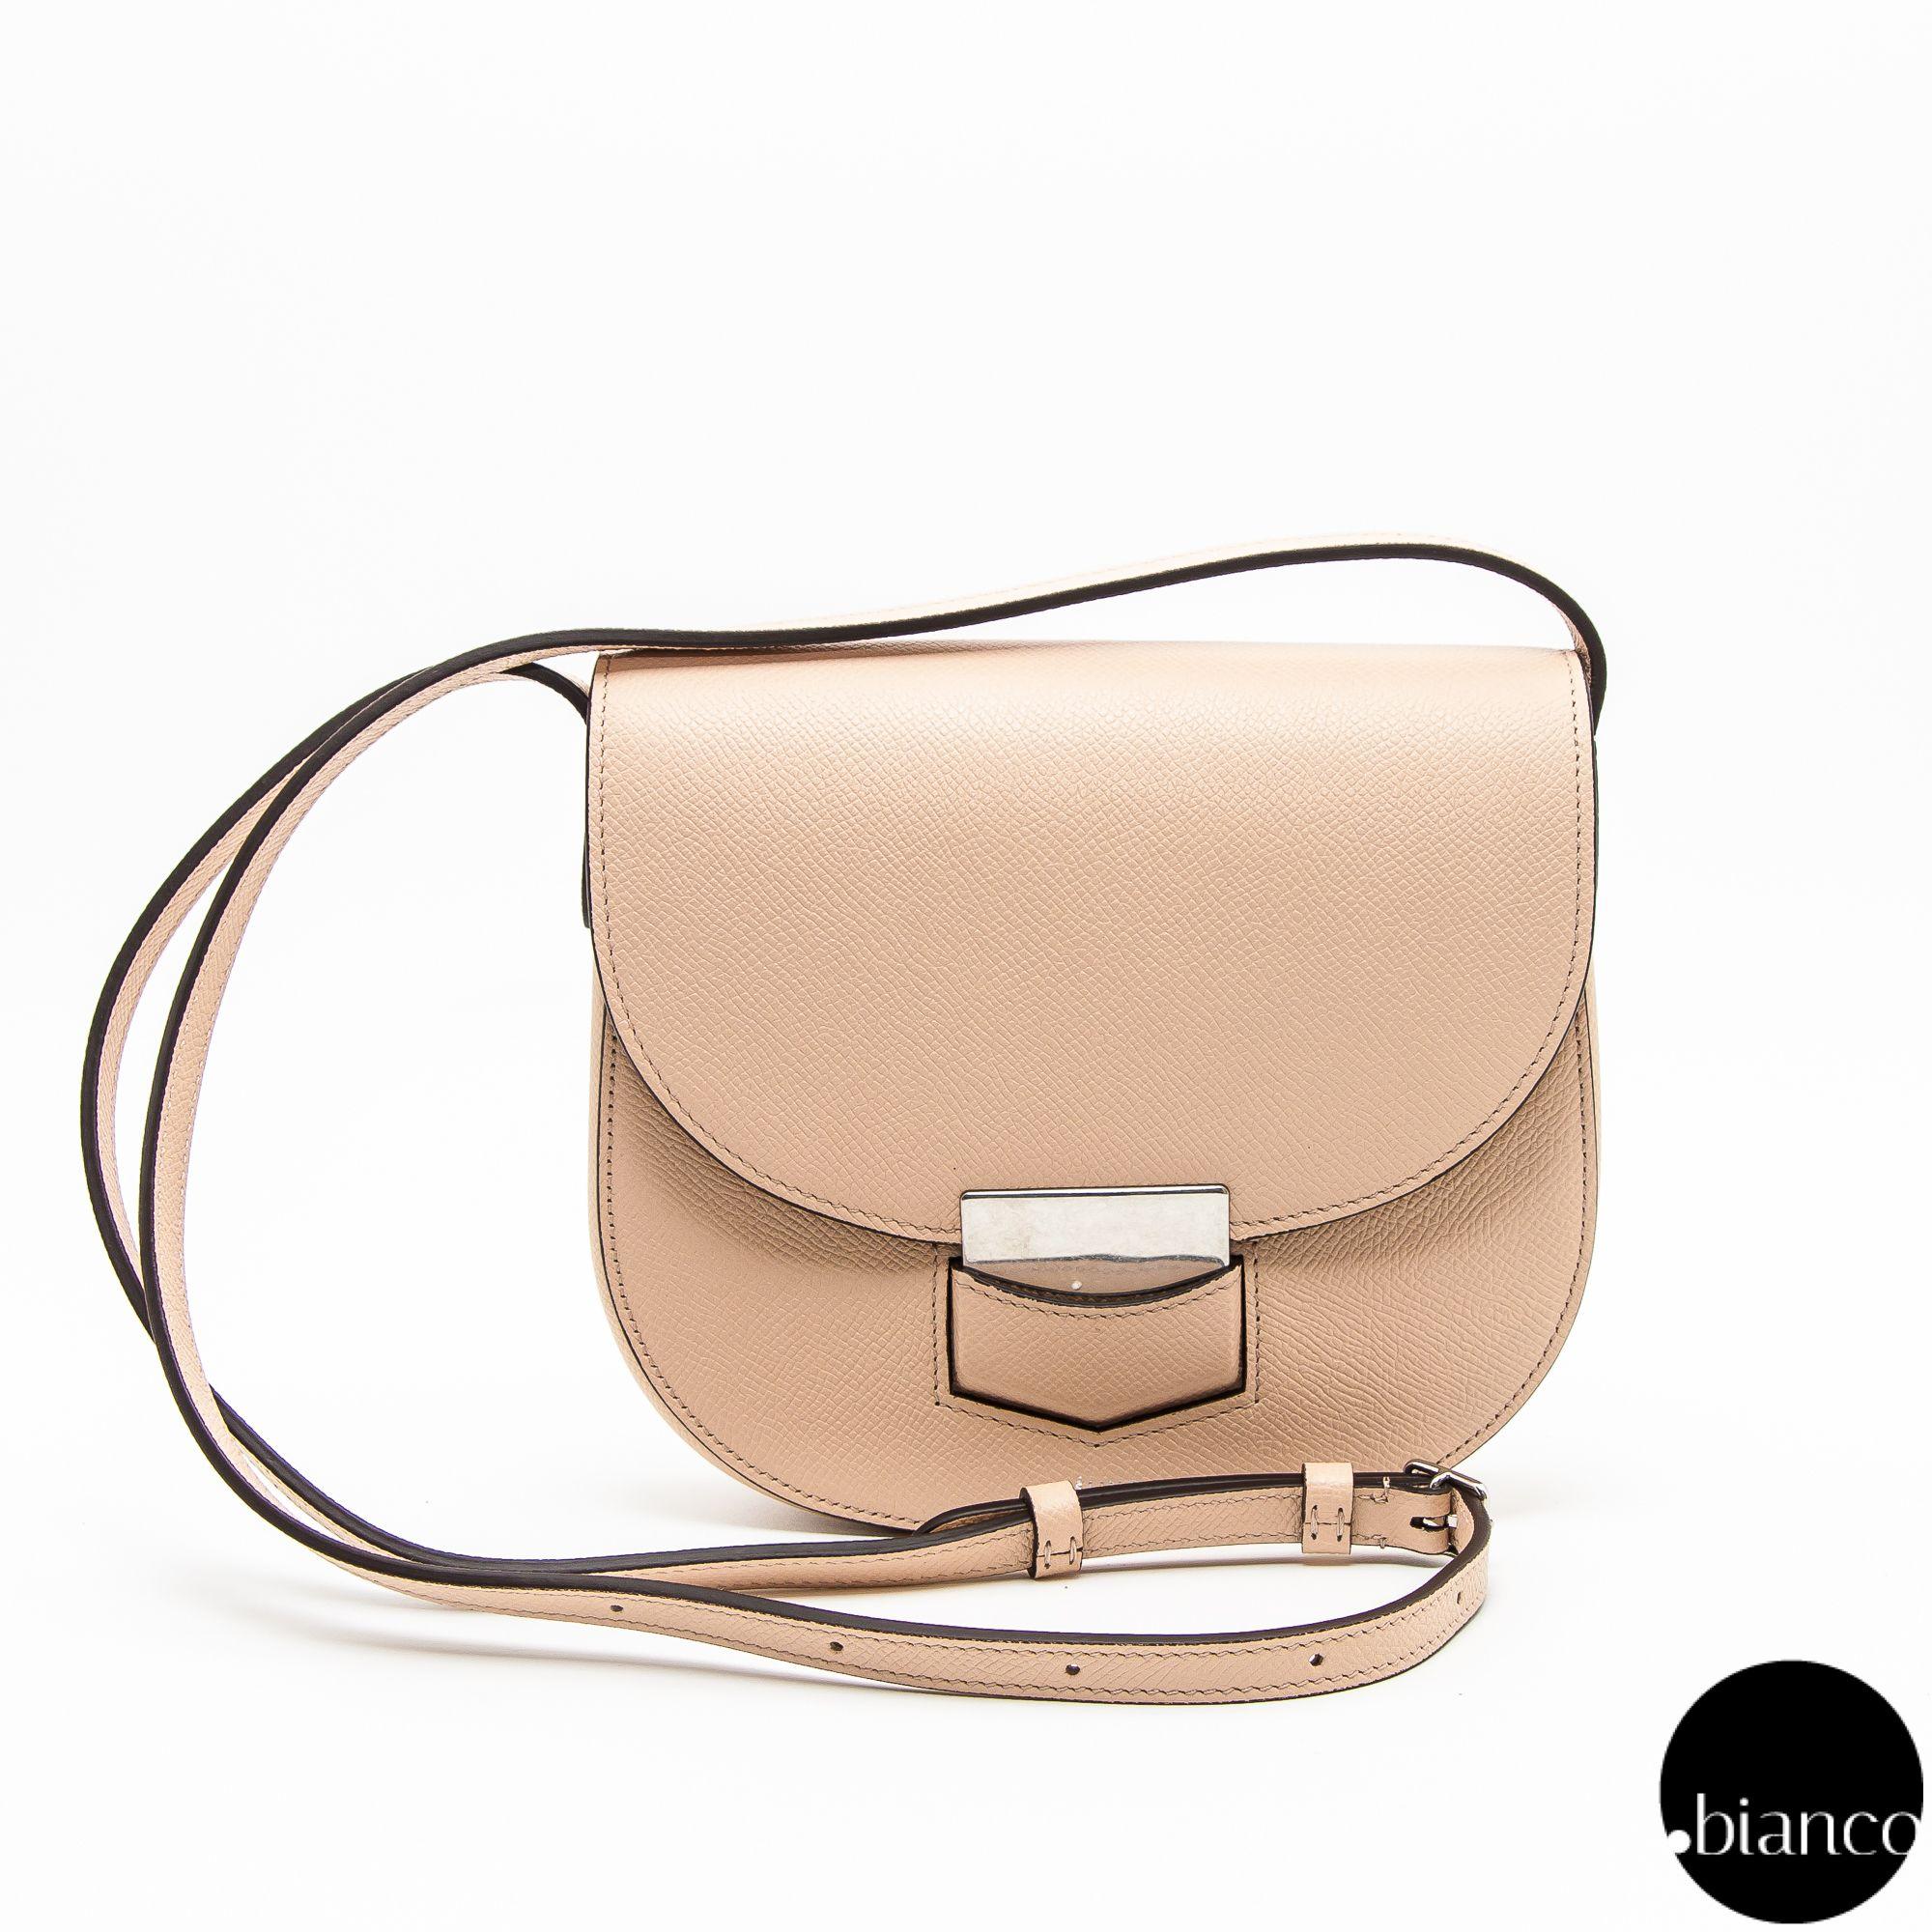 880a100b06 CELINE Shoulder Bags Calfskin 2WAY Plain Elegant Style Luxury Brand ...